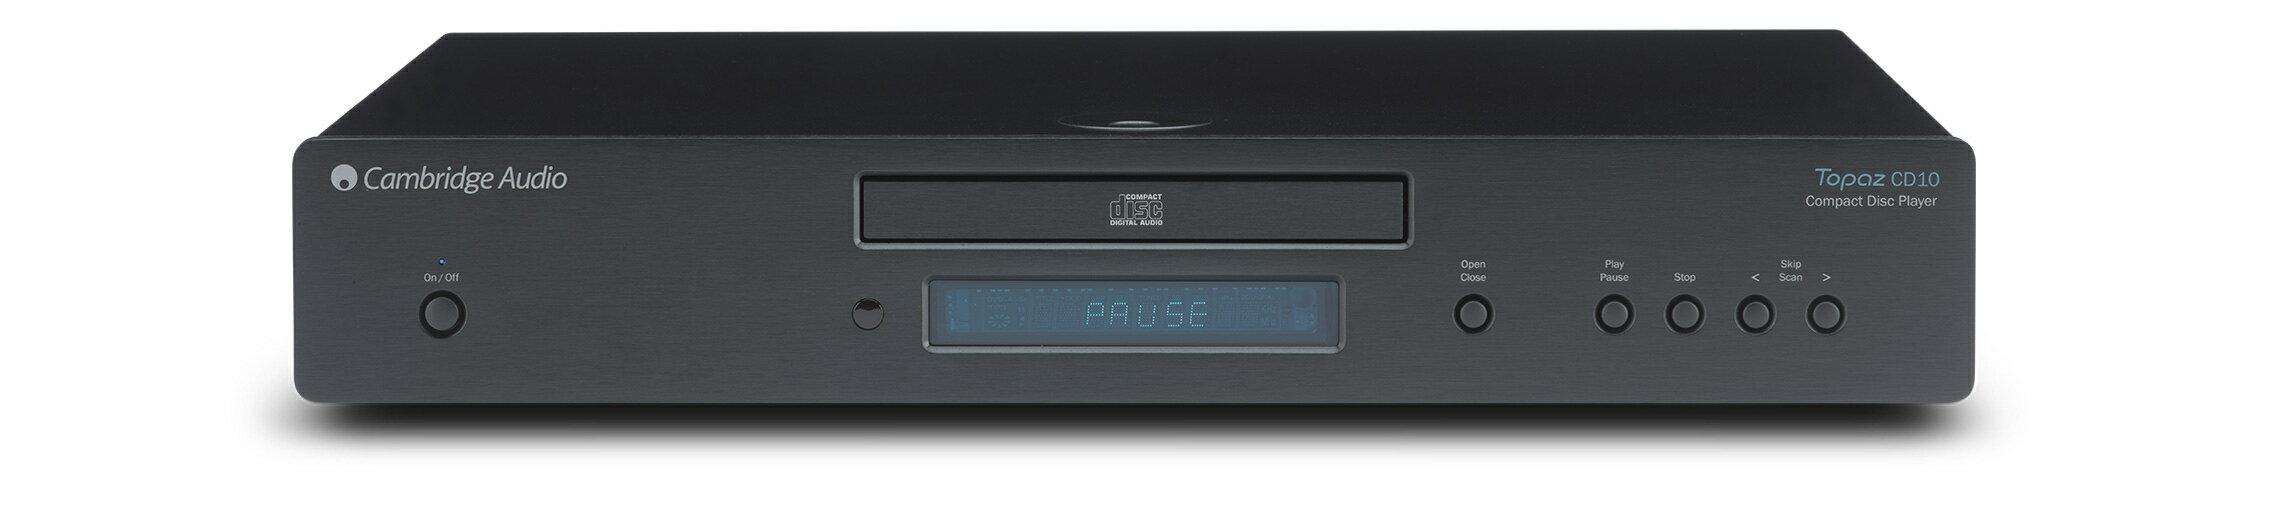 【CD10 CD播放機】 Cambridge Audio 英國劍橋音響 家庭劇院 CD BD AV 擴大機 數位串流 收音機